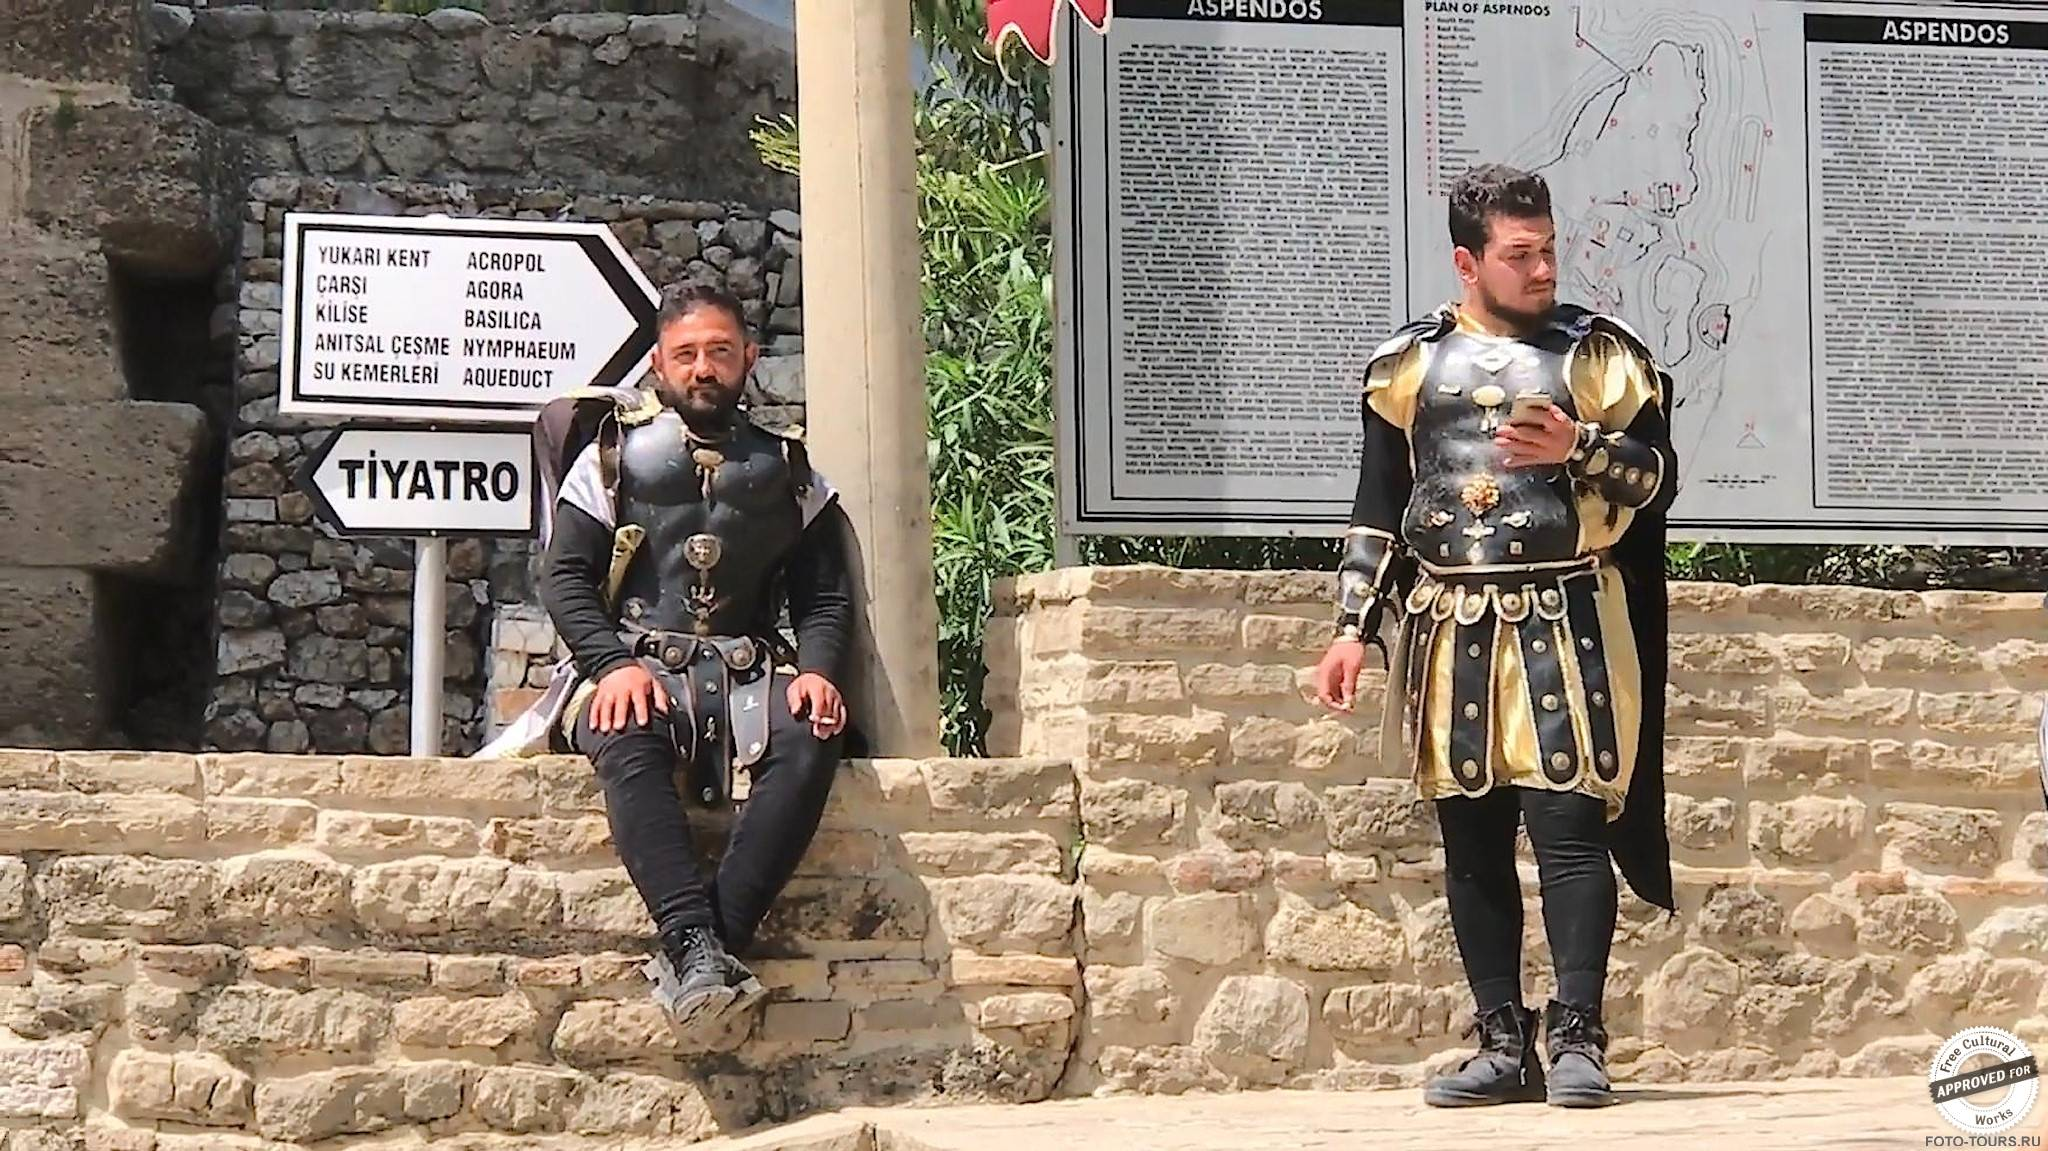 Аспендос в Анталии, Турция, Азия.